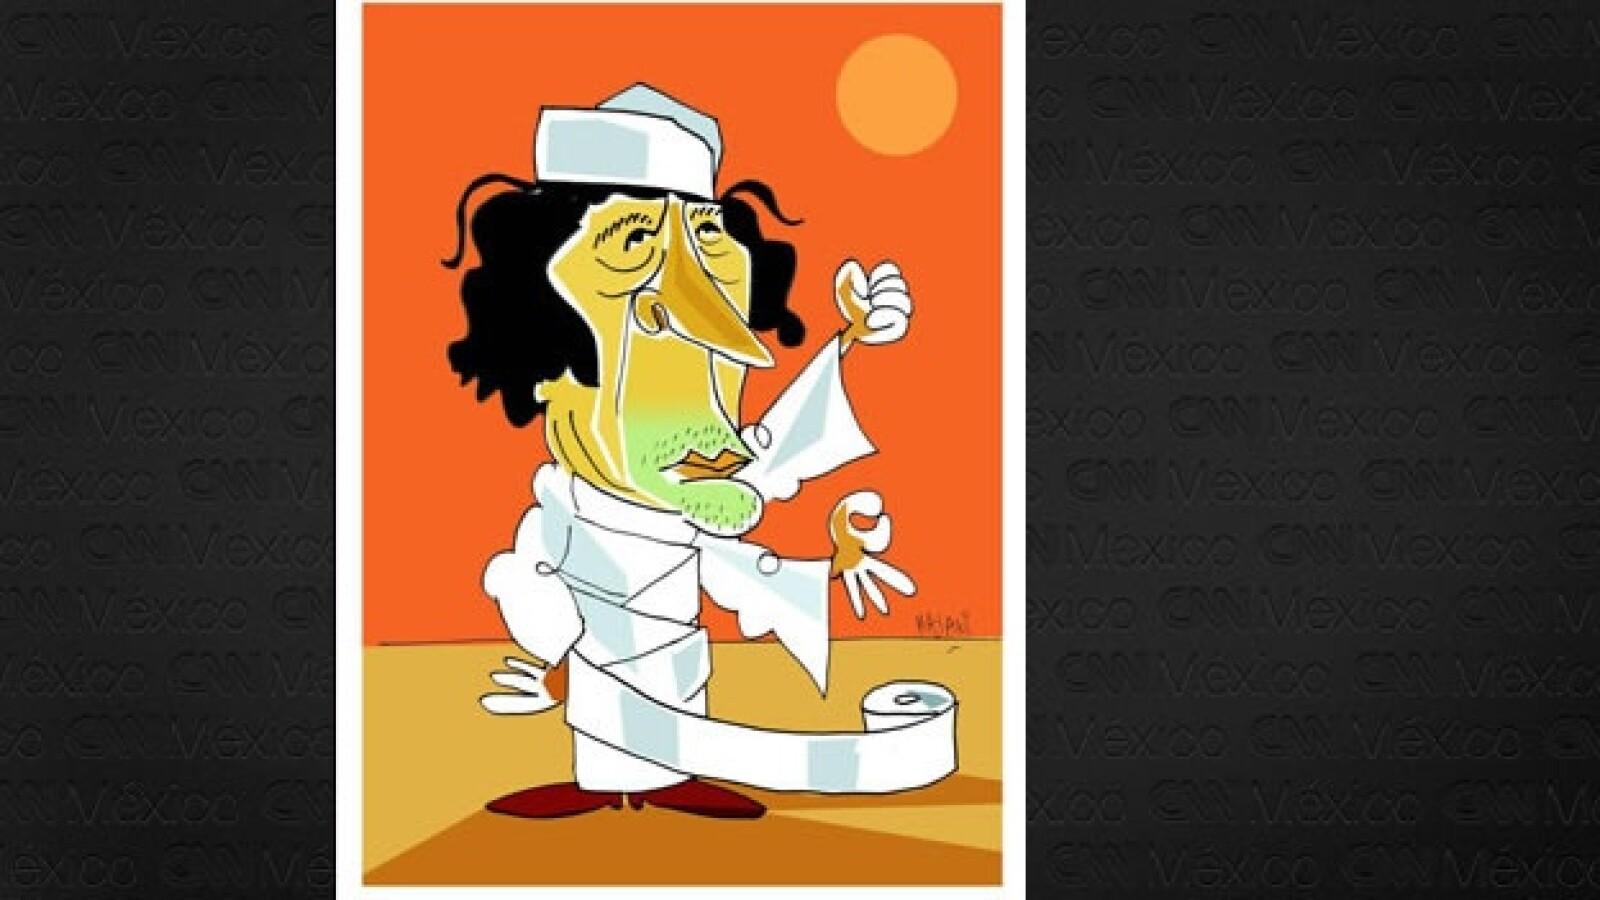 Gadhafi - caricatura - Hayati Boyacioglu